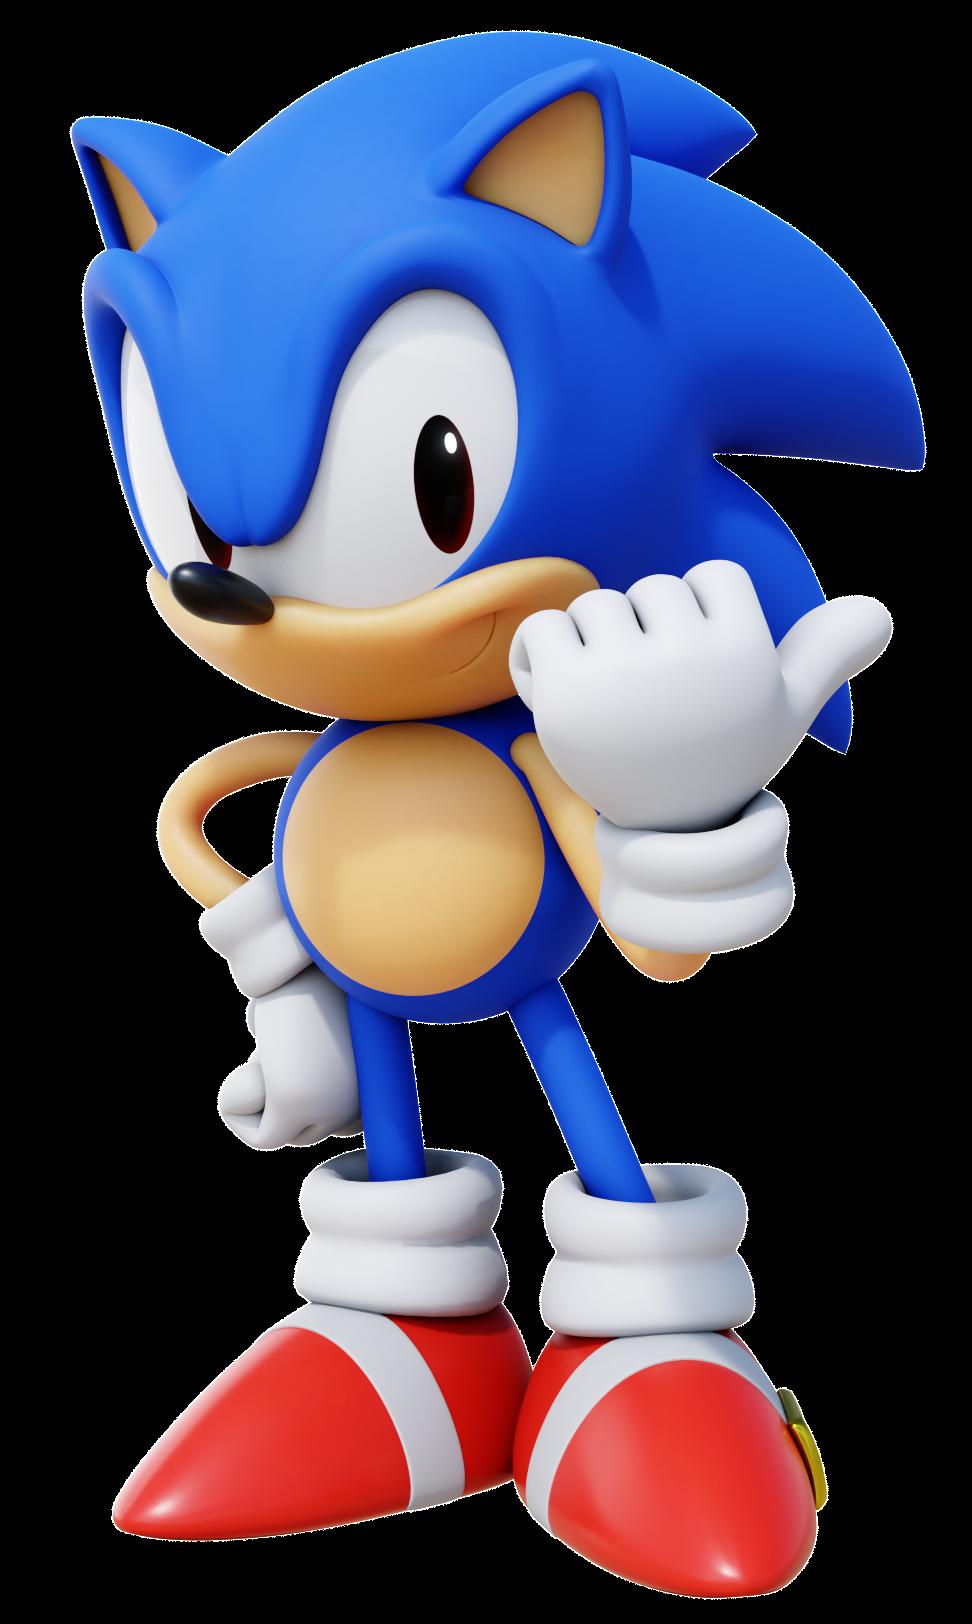 Sonic 2 HD by Pho3nixSFM on DeviantArt